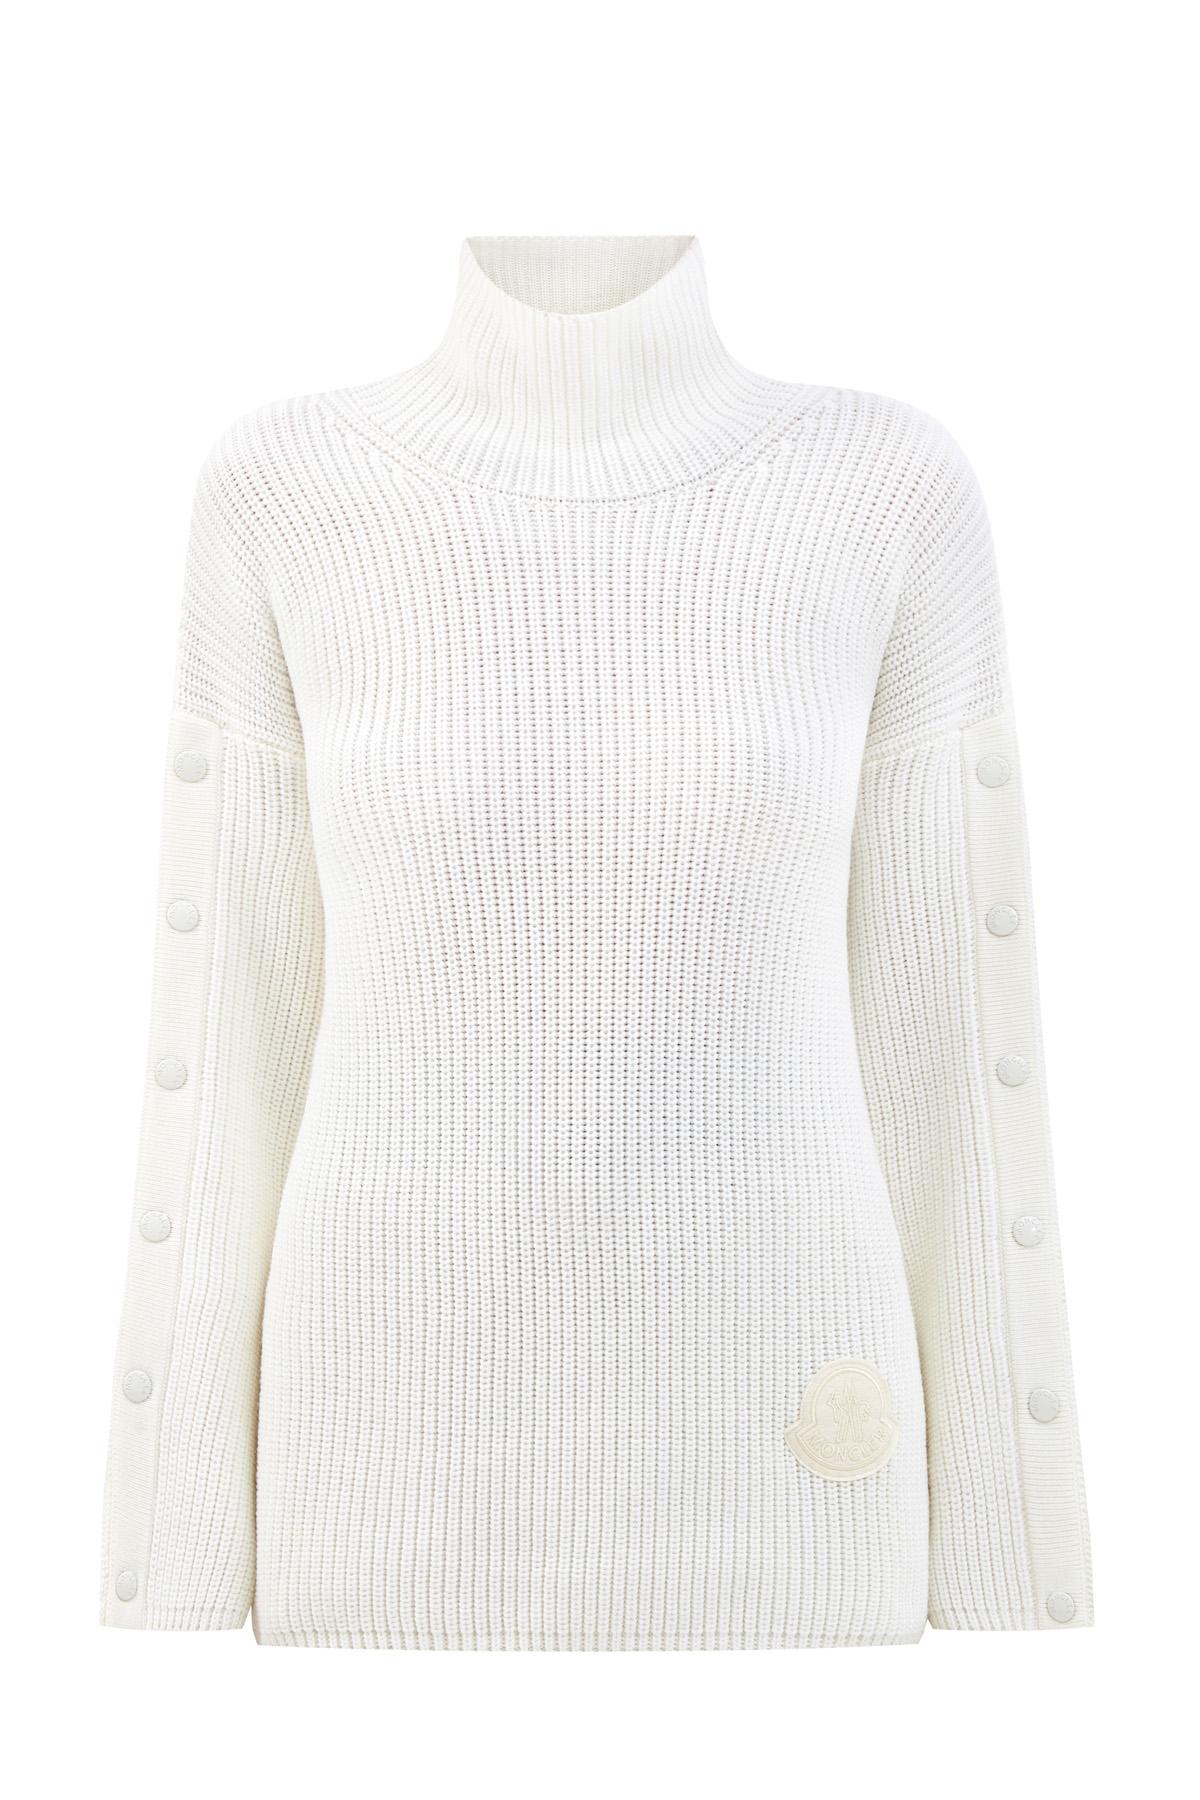 Шерстяной свитер крупной вязки с разрезами на рукавах фото